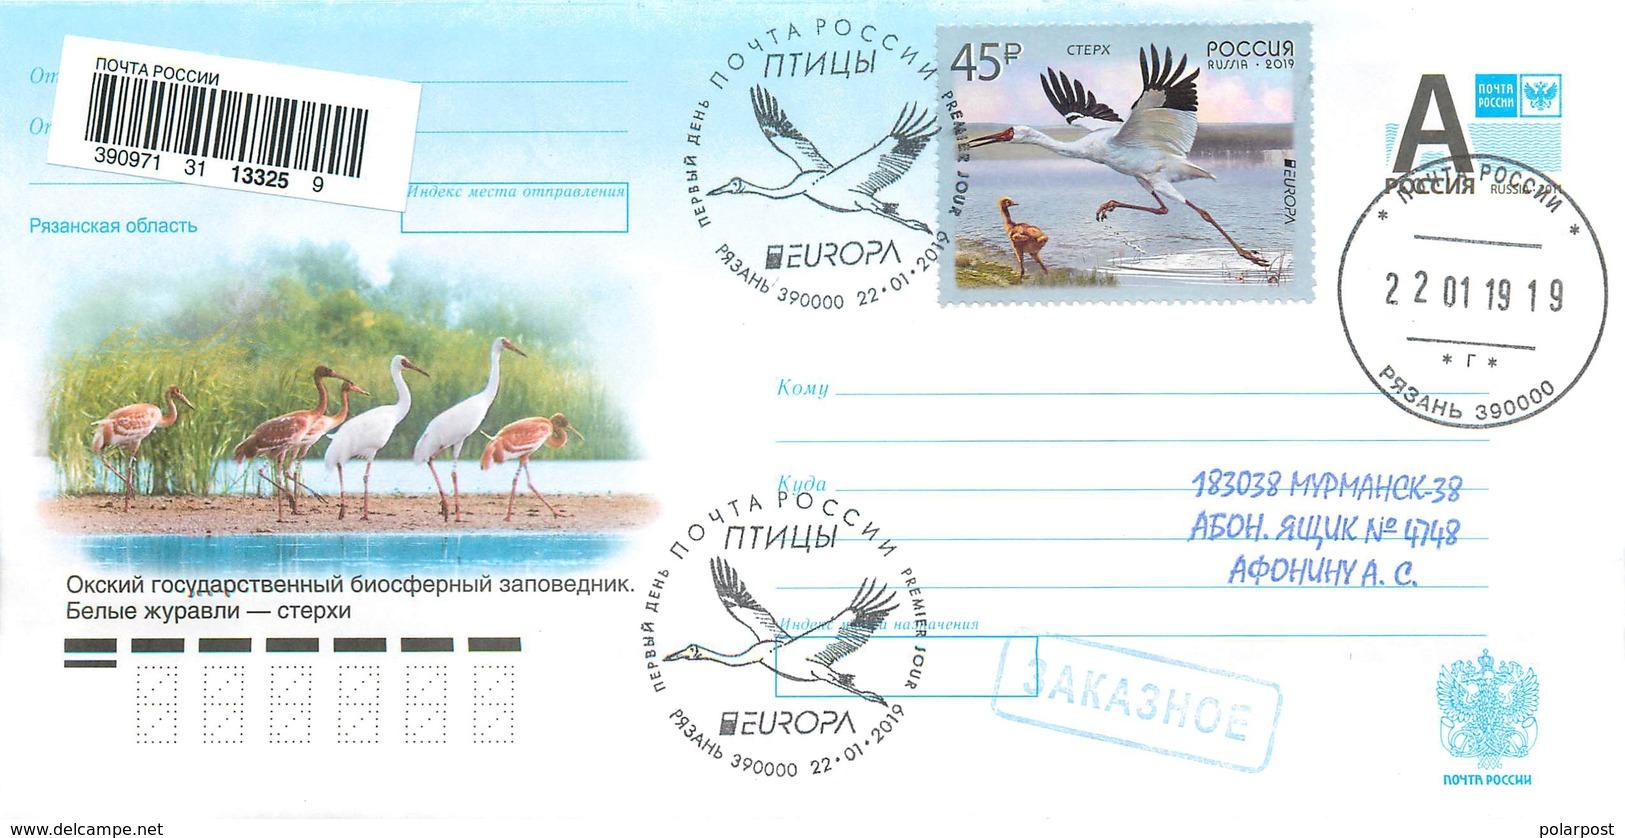 "RUSSIA 2019 2436. The Release Of The Program ""Europe"" Birds Of Siberian Corks Oksky Natural Biosphere Reserve (Ryazan) - Storks & Long-legged Wading Birds"